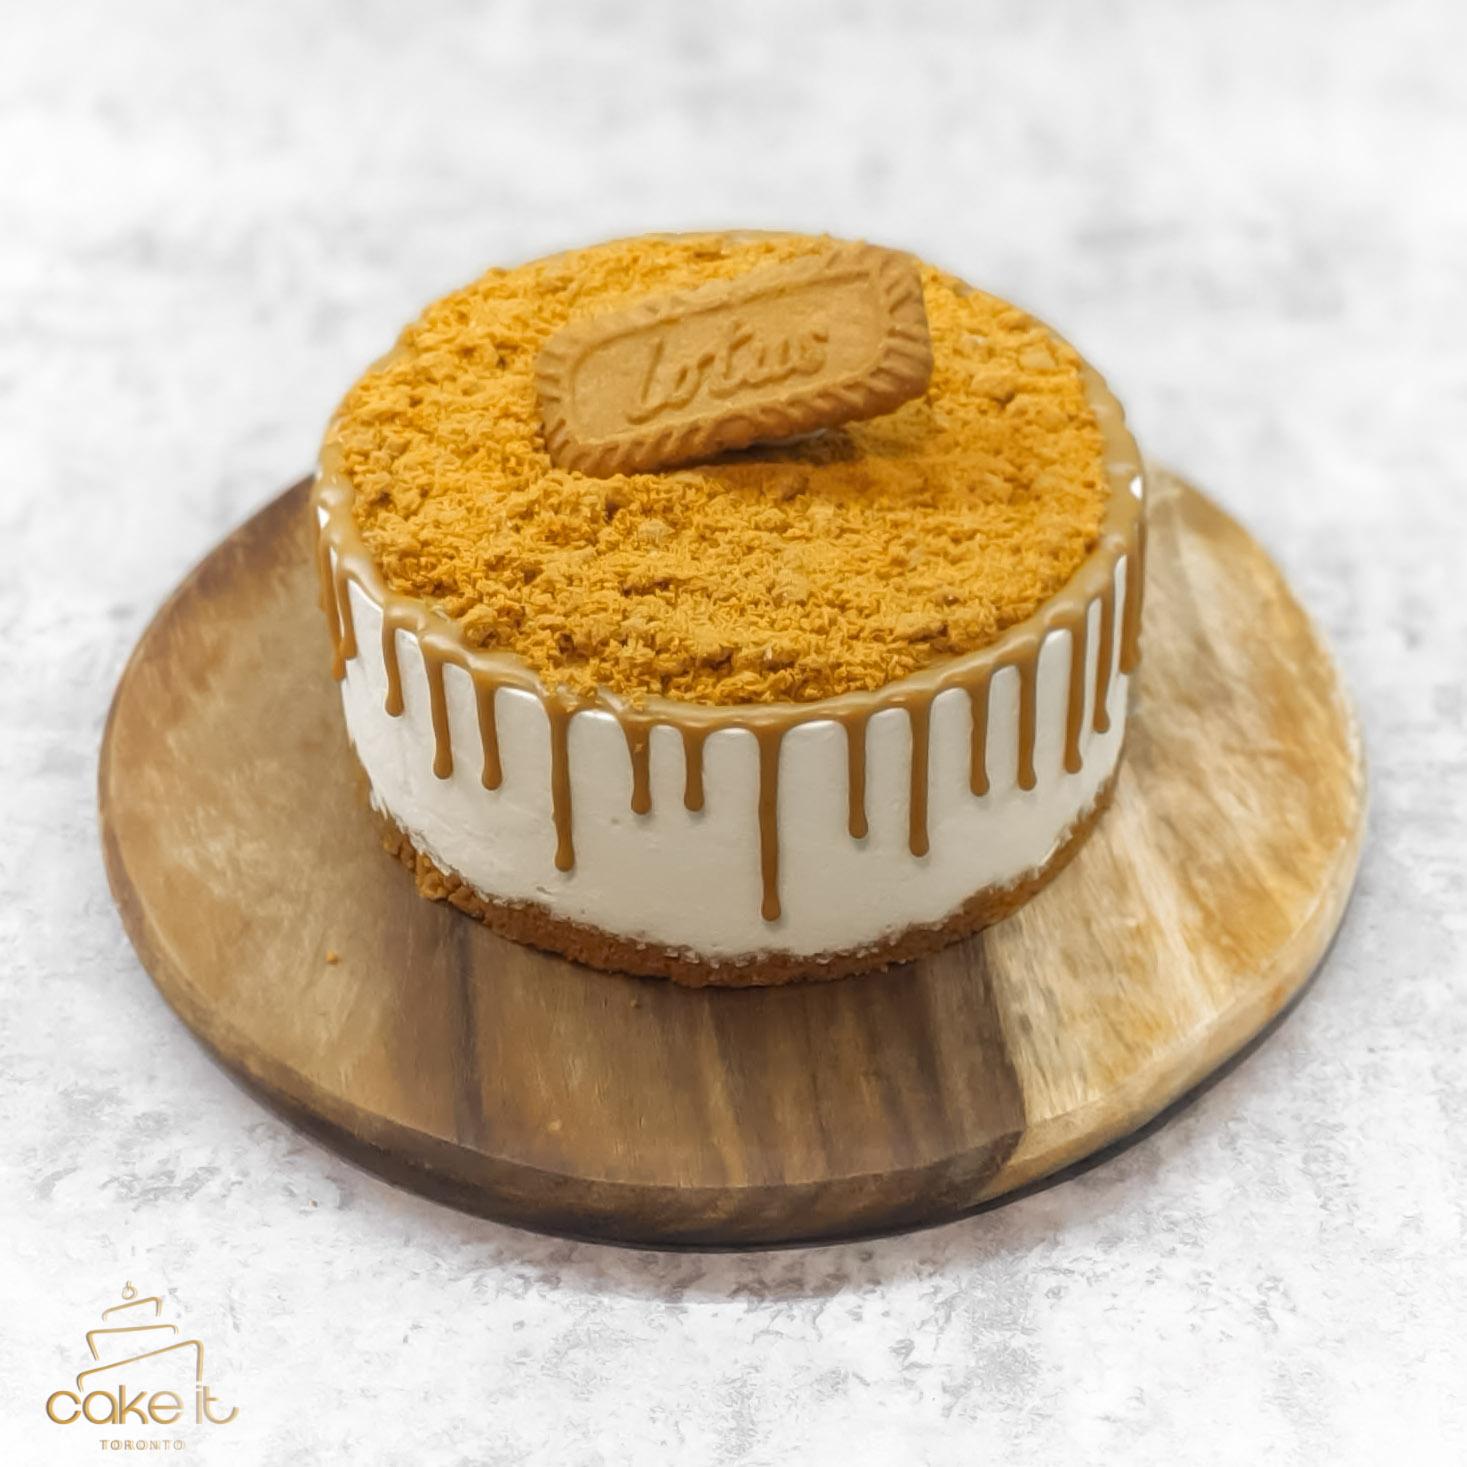 Lotus Biscoff & White Chocolate Mousse